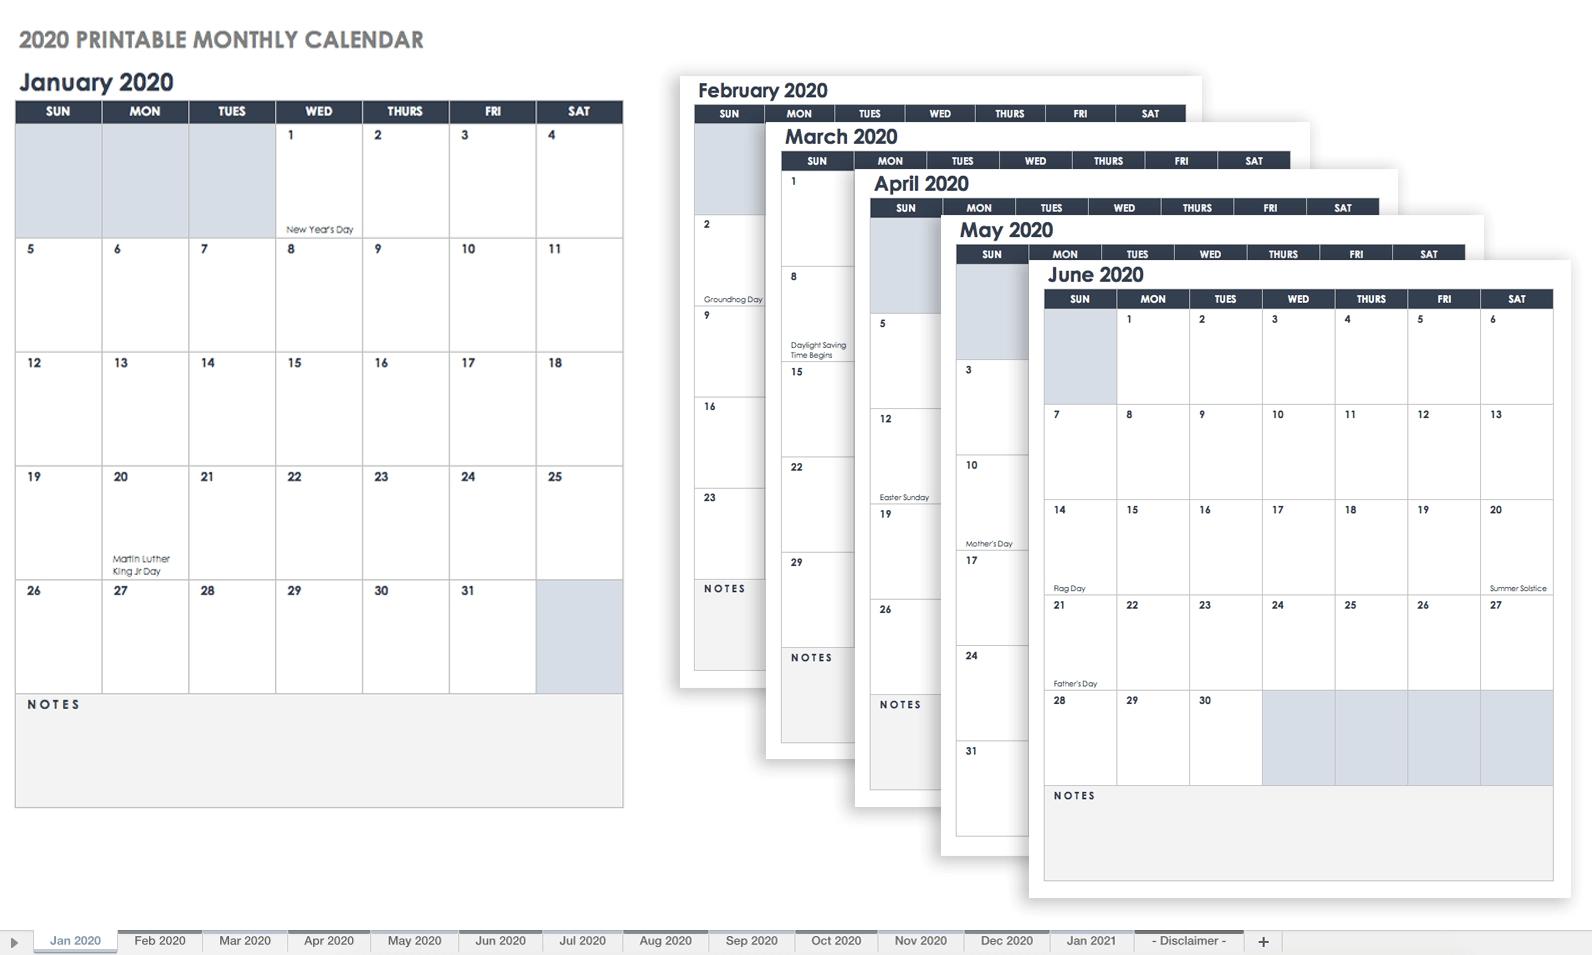 Free Blank Calendar Templates - Smartsheet regarding Editable Printable Calendars By Month